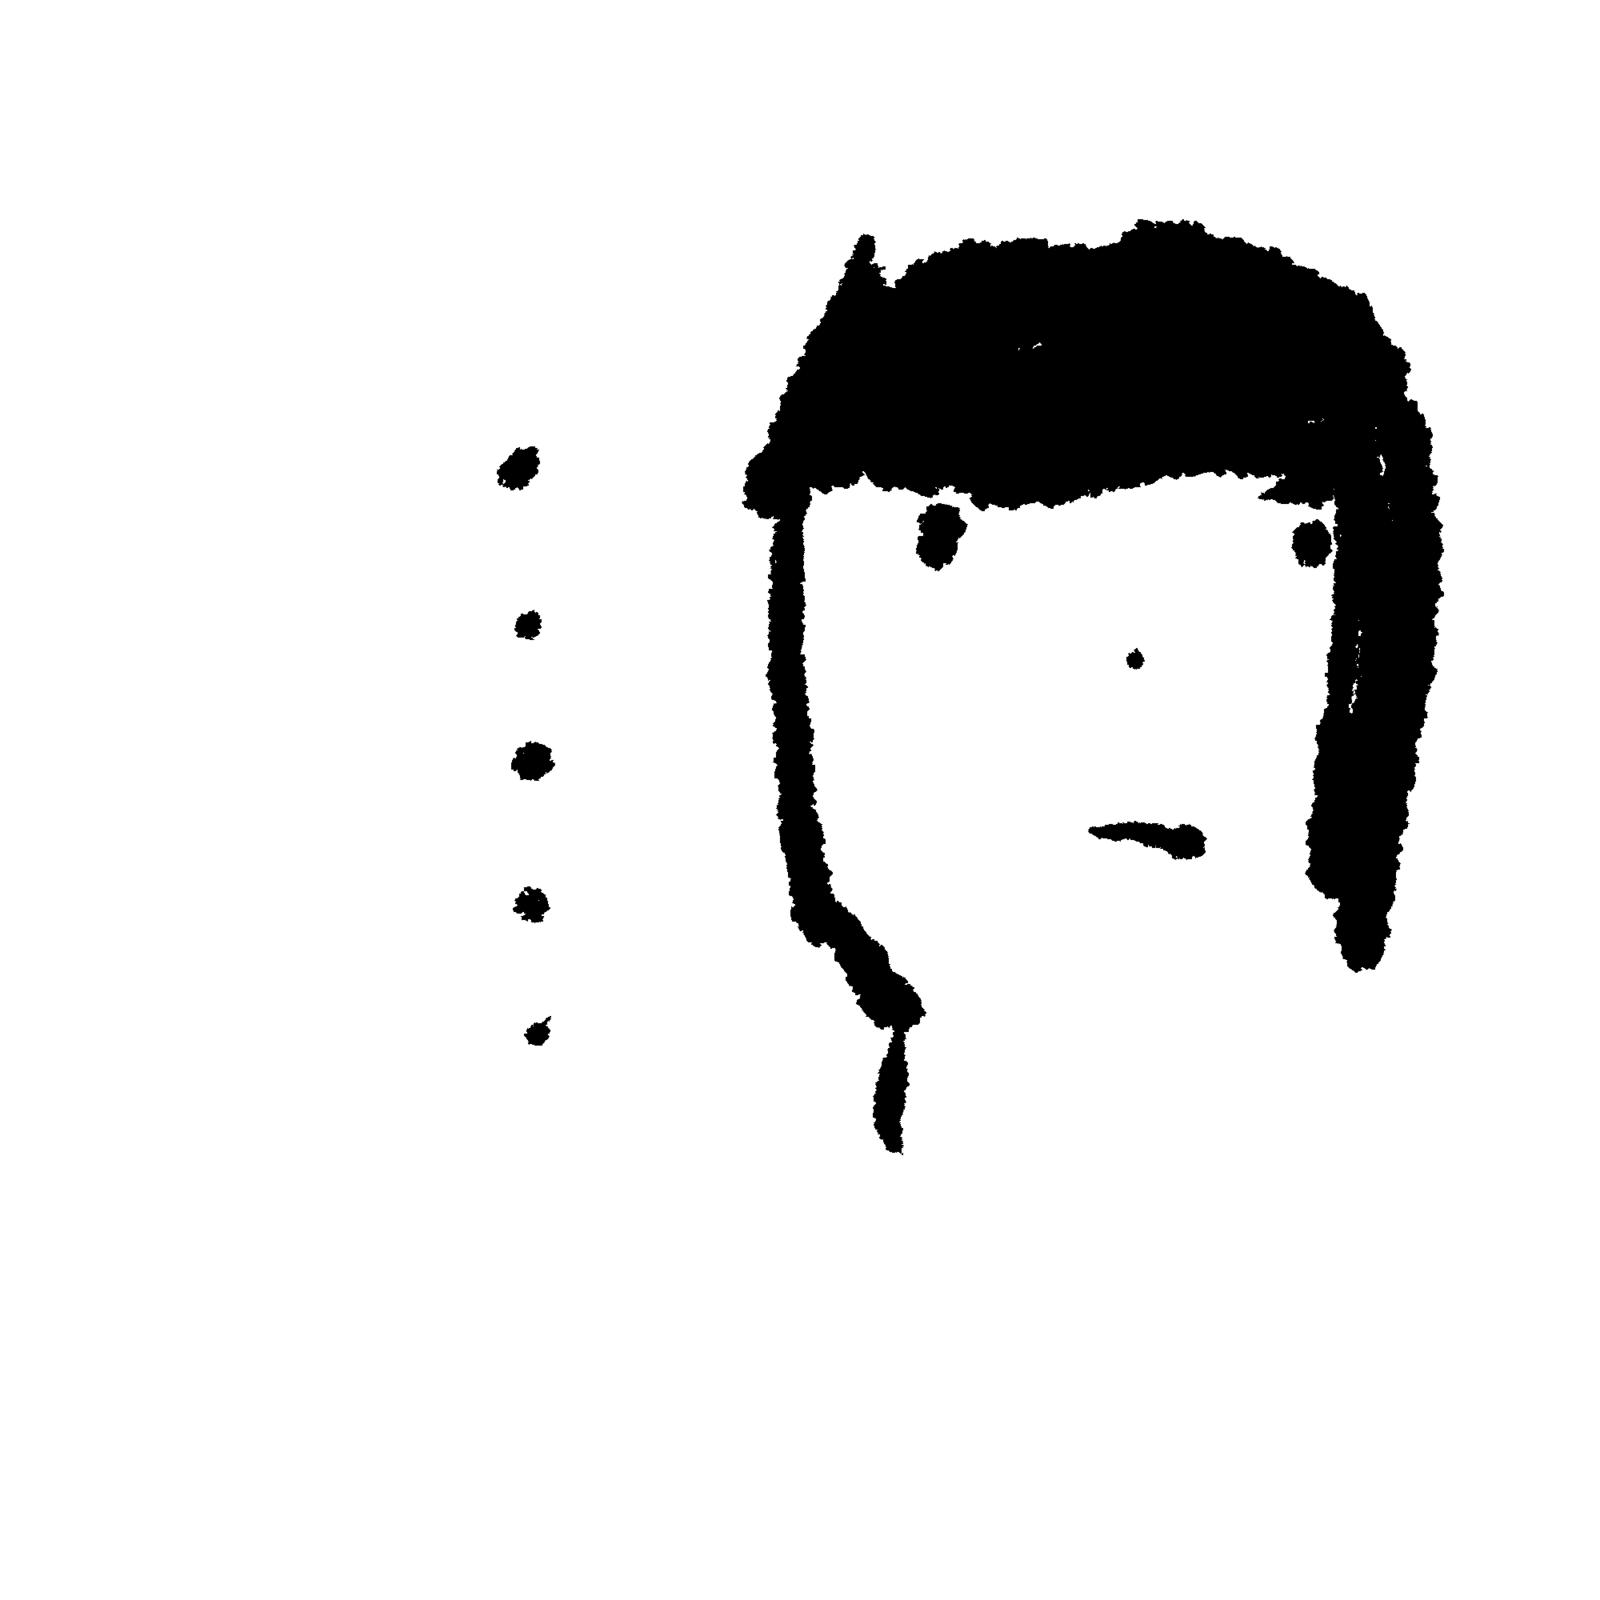 f:id:Haruosan:20200106053638p:plain